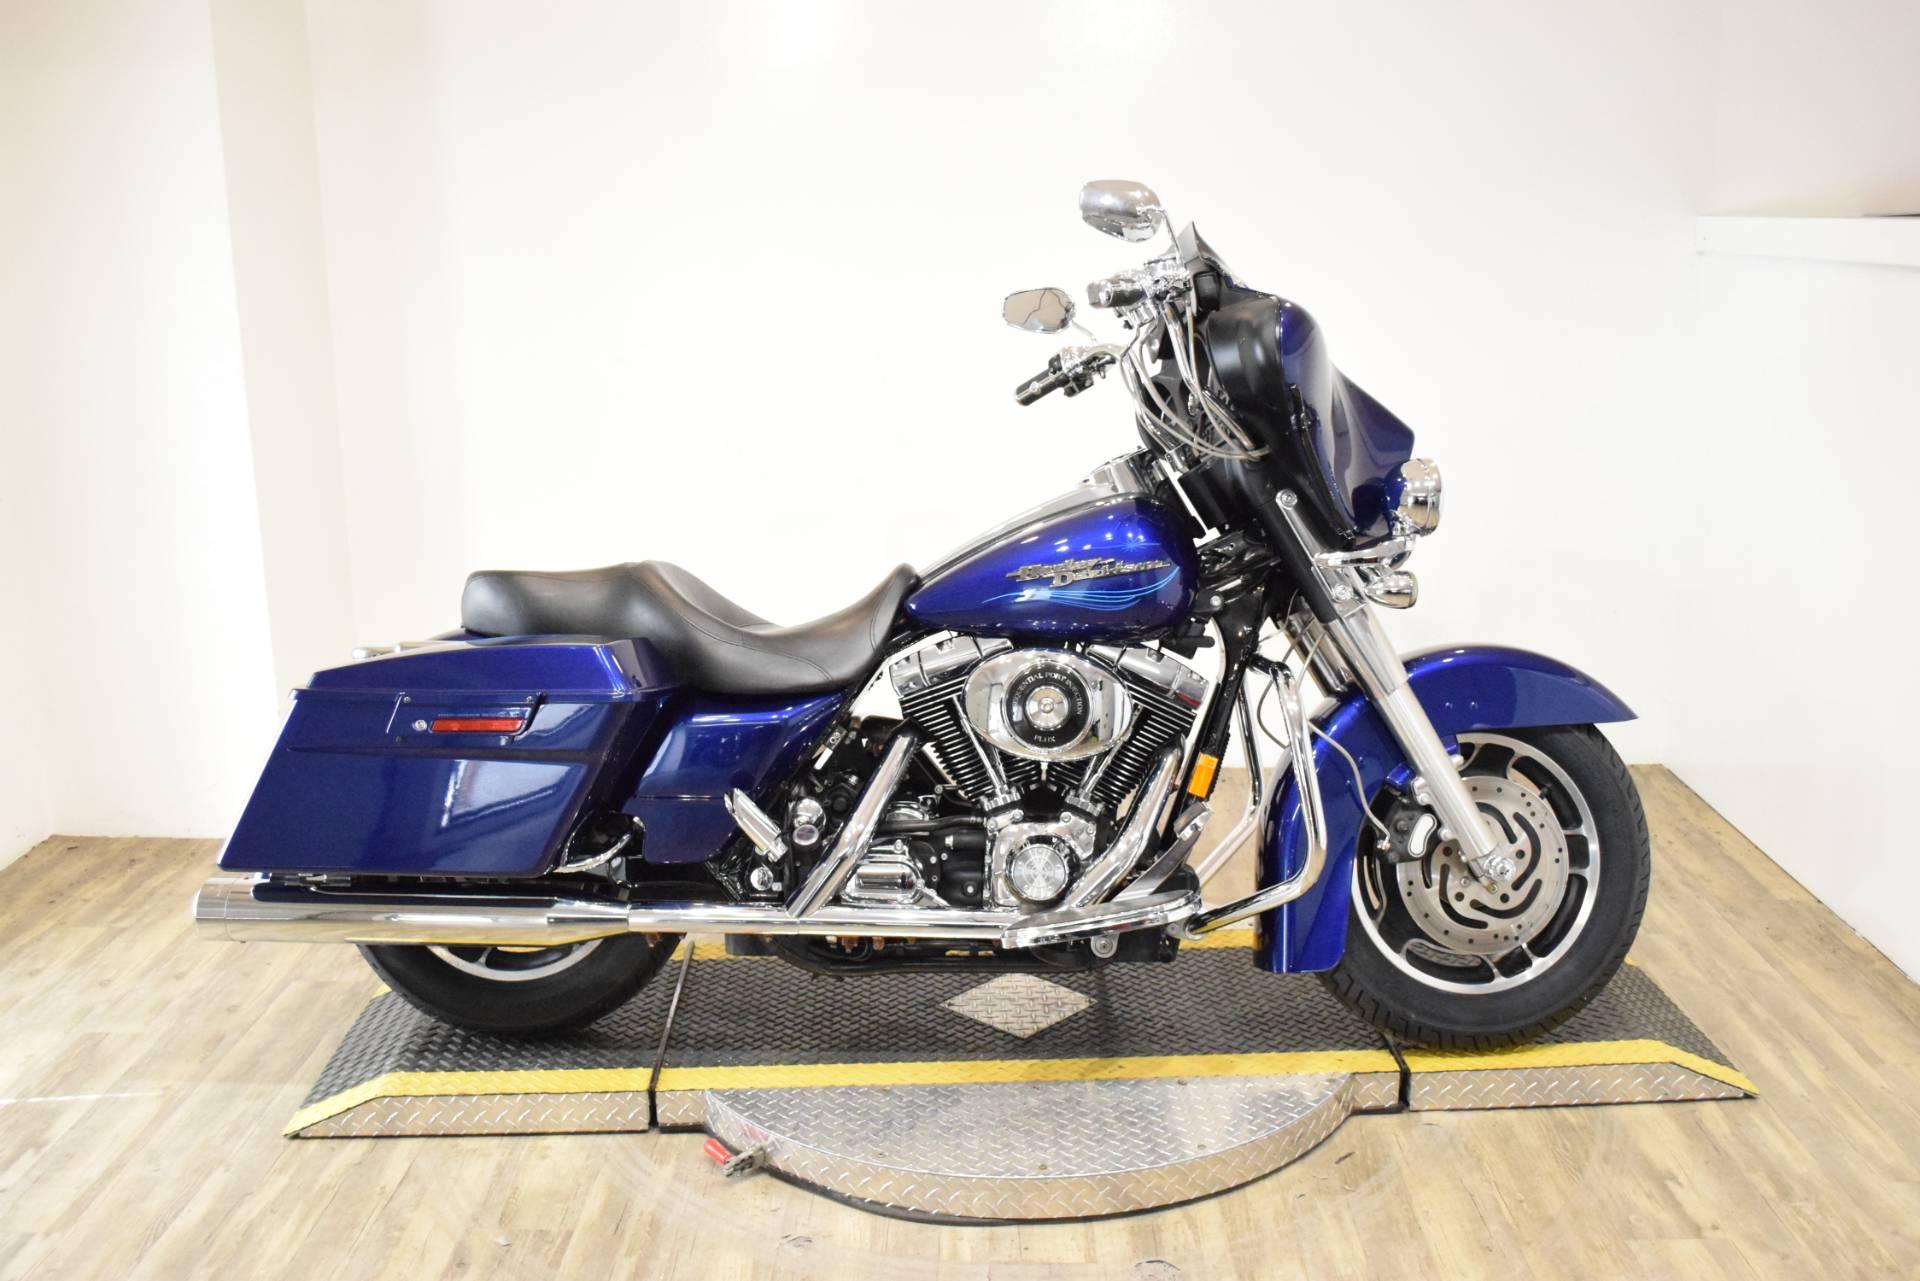 Street Glide For Sale >> 2006 Harley Davidson Street Glide In Wauconda Illinois